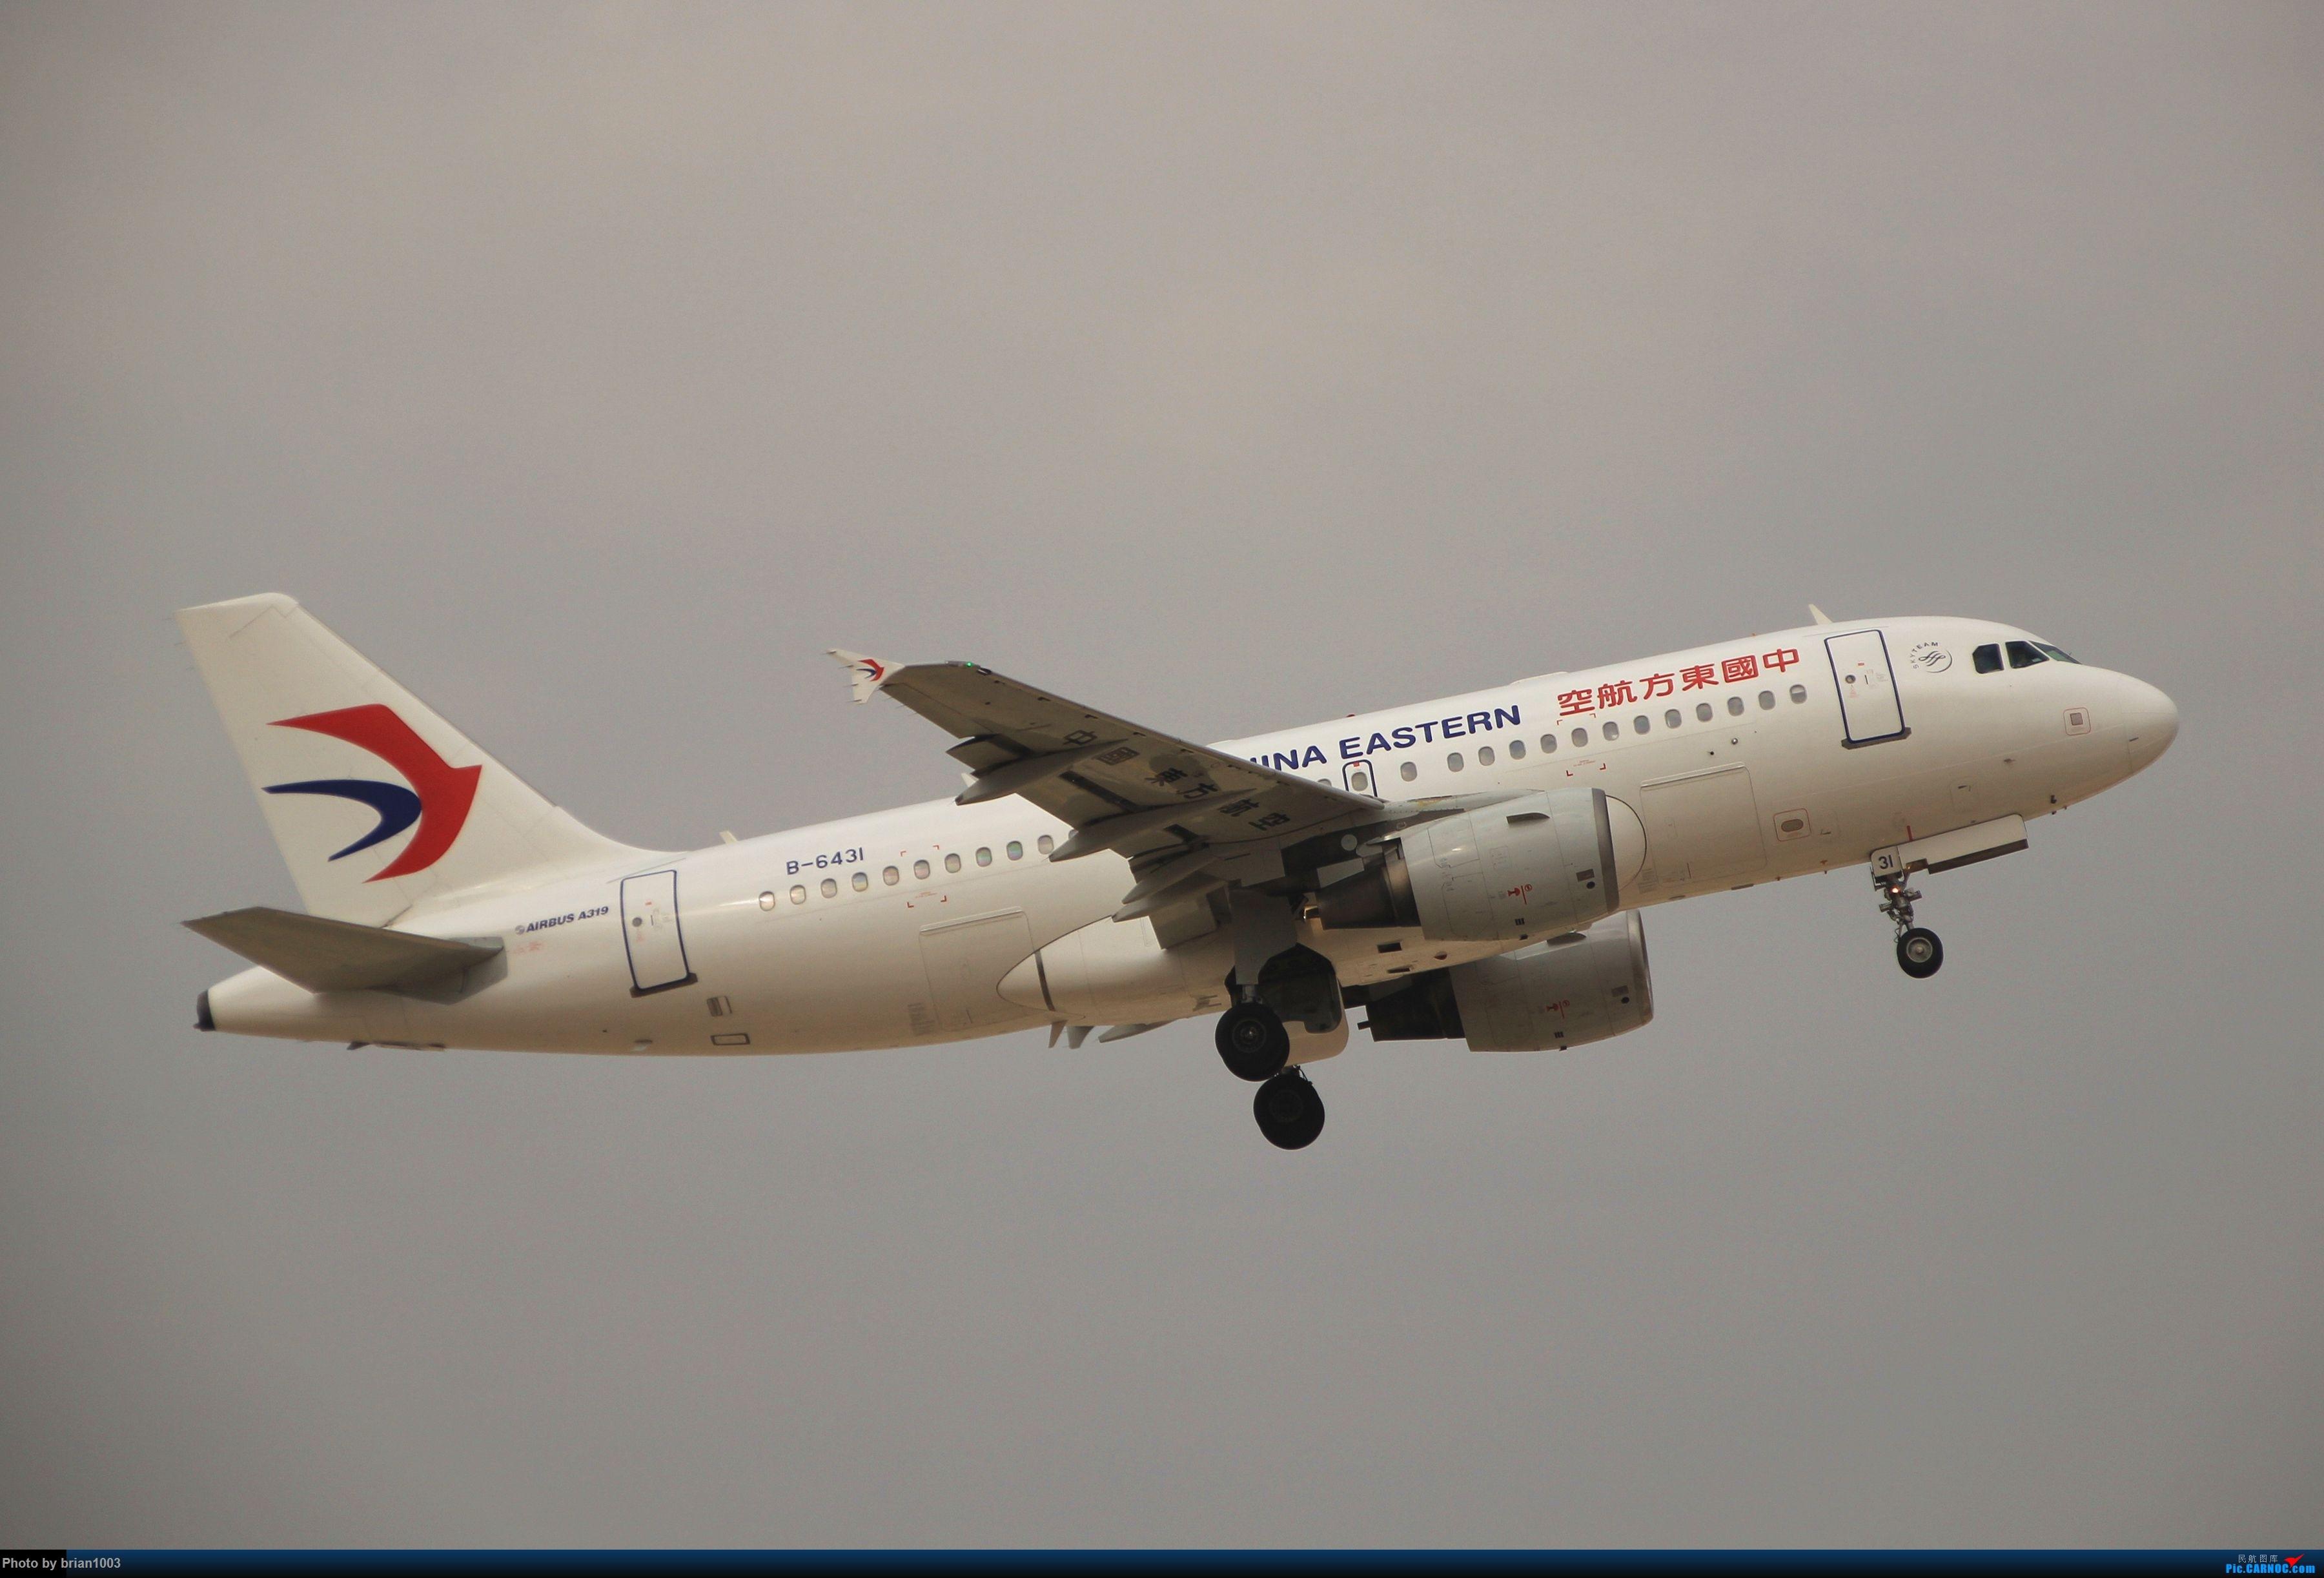 Re:[原创]WUH武汉天河机场拍机之新航季来的海航333和幸福的738 AIRBUS A319-100 B-6431 中国武汉天河国际机场